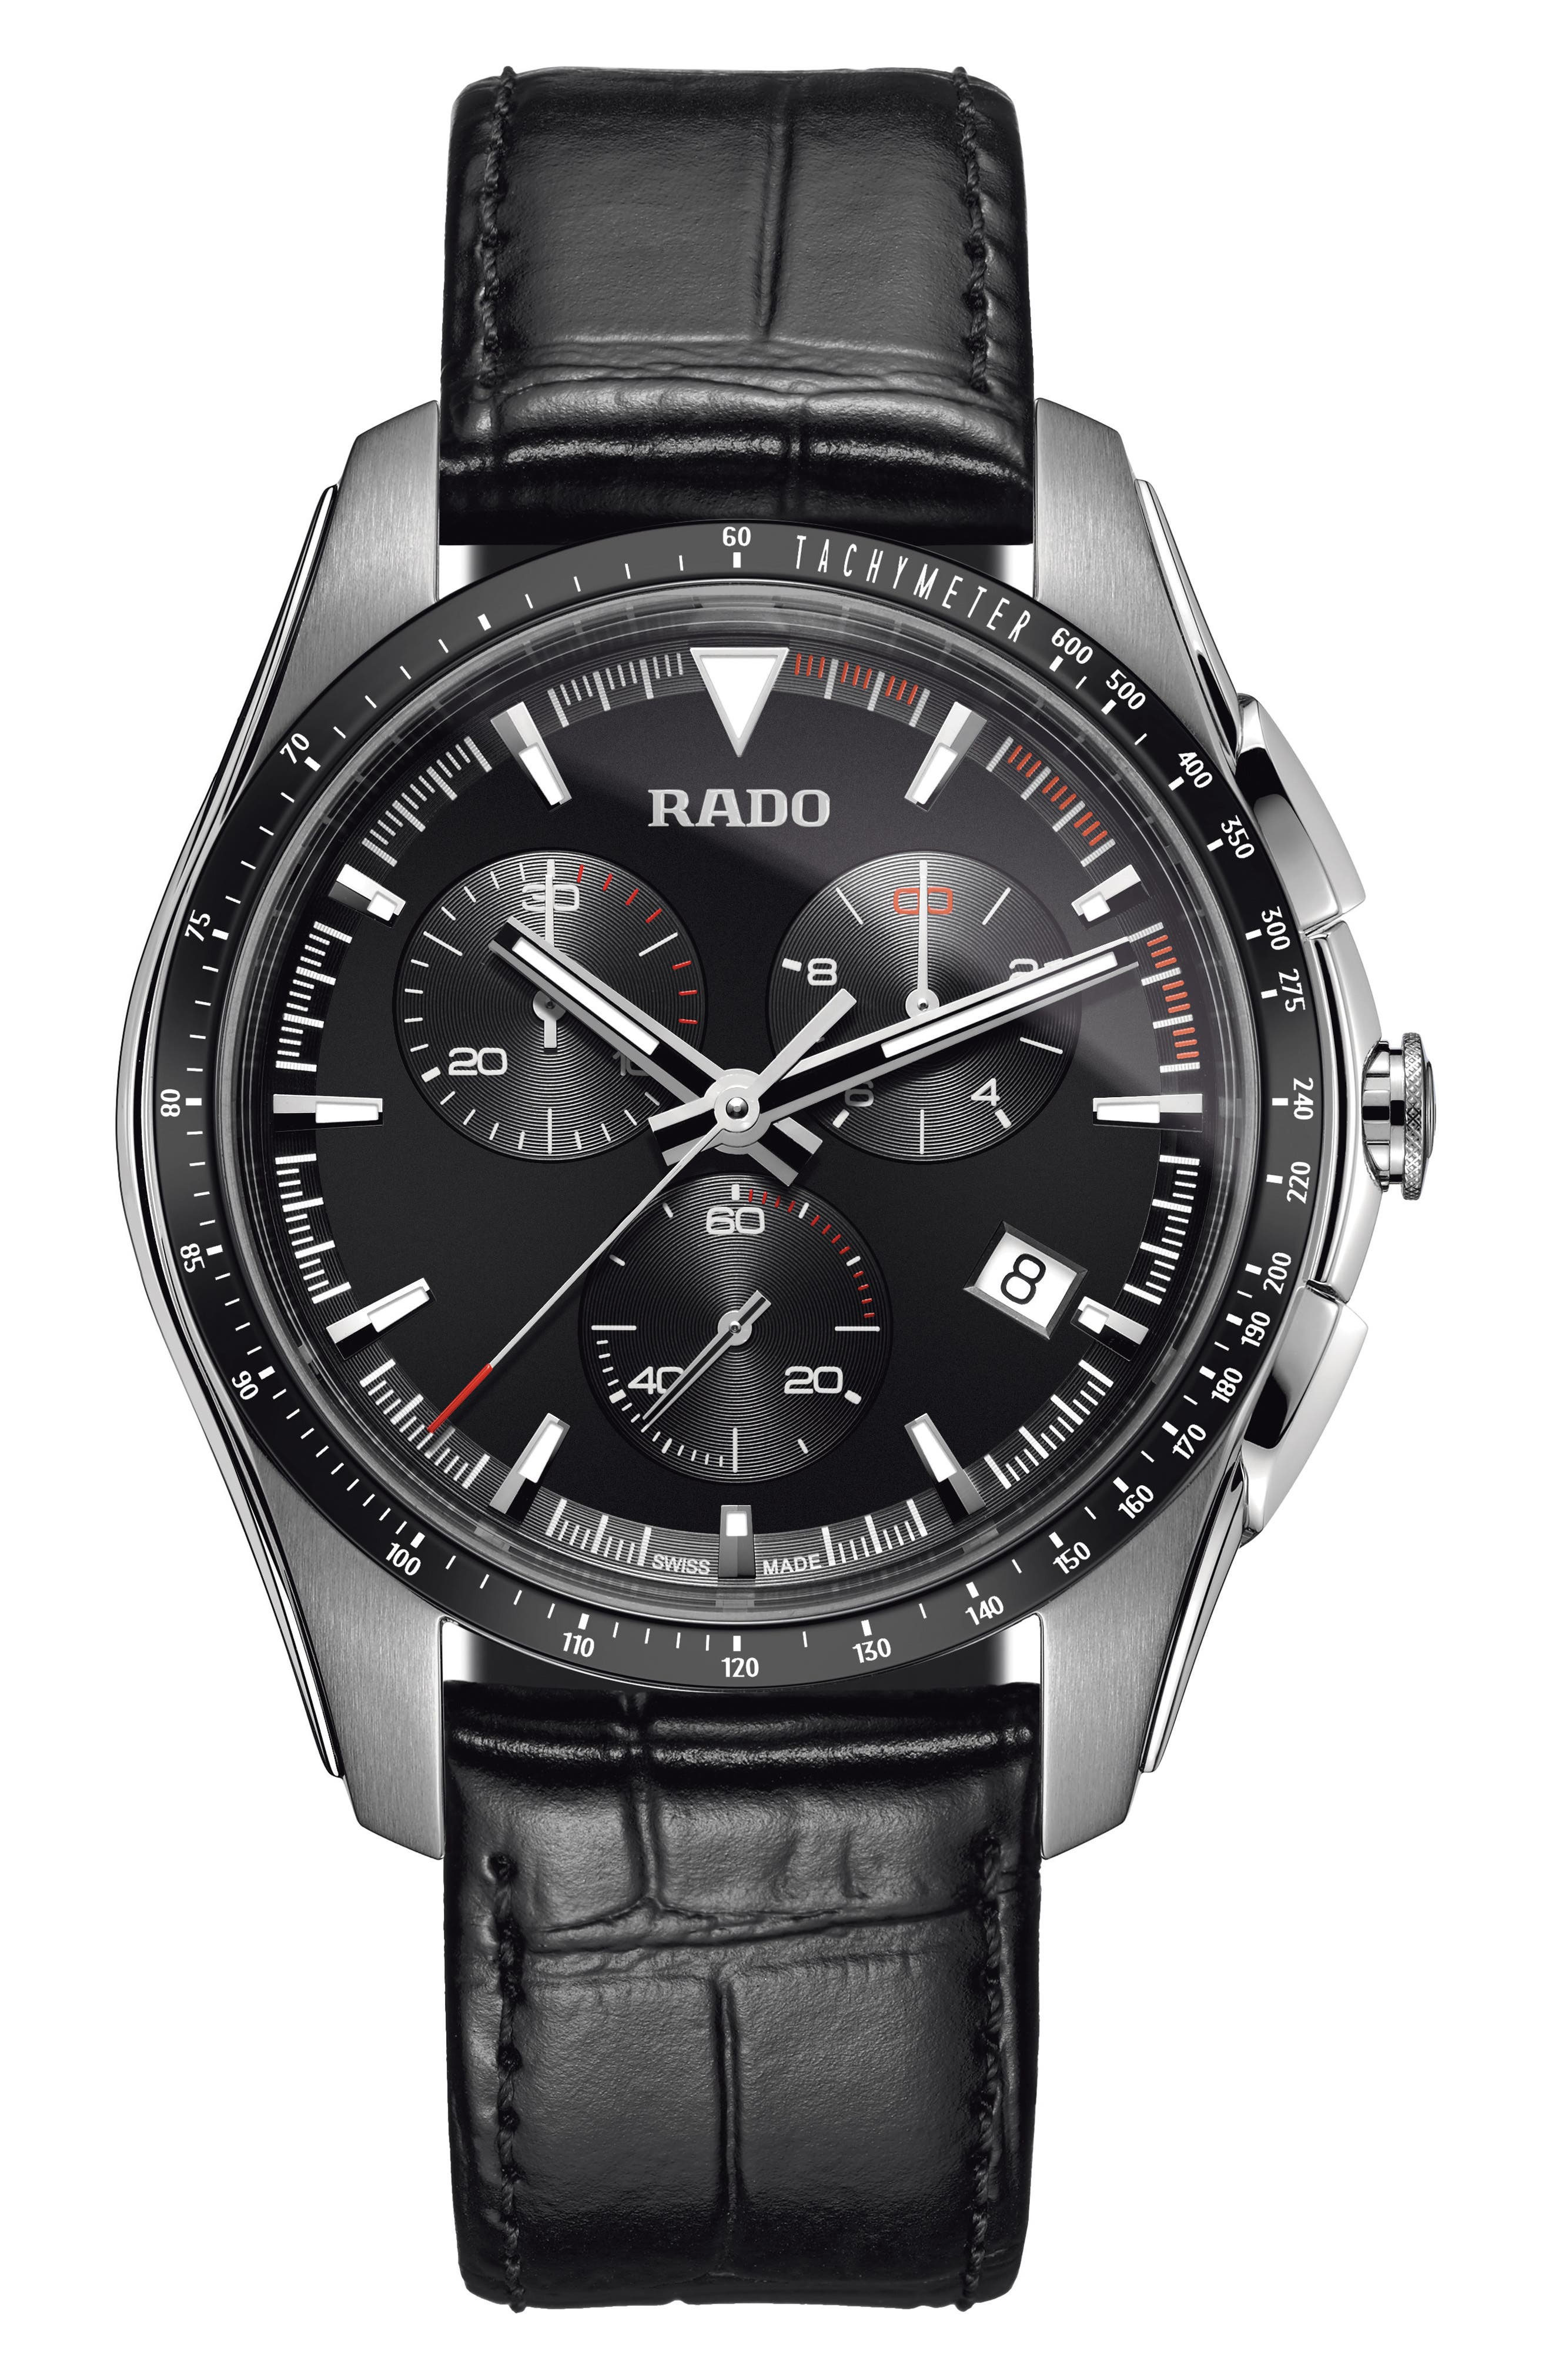 Main Image - RADO HyperChrome Chronograph Leather Strap Watch, 45mm